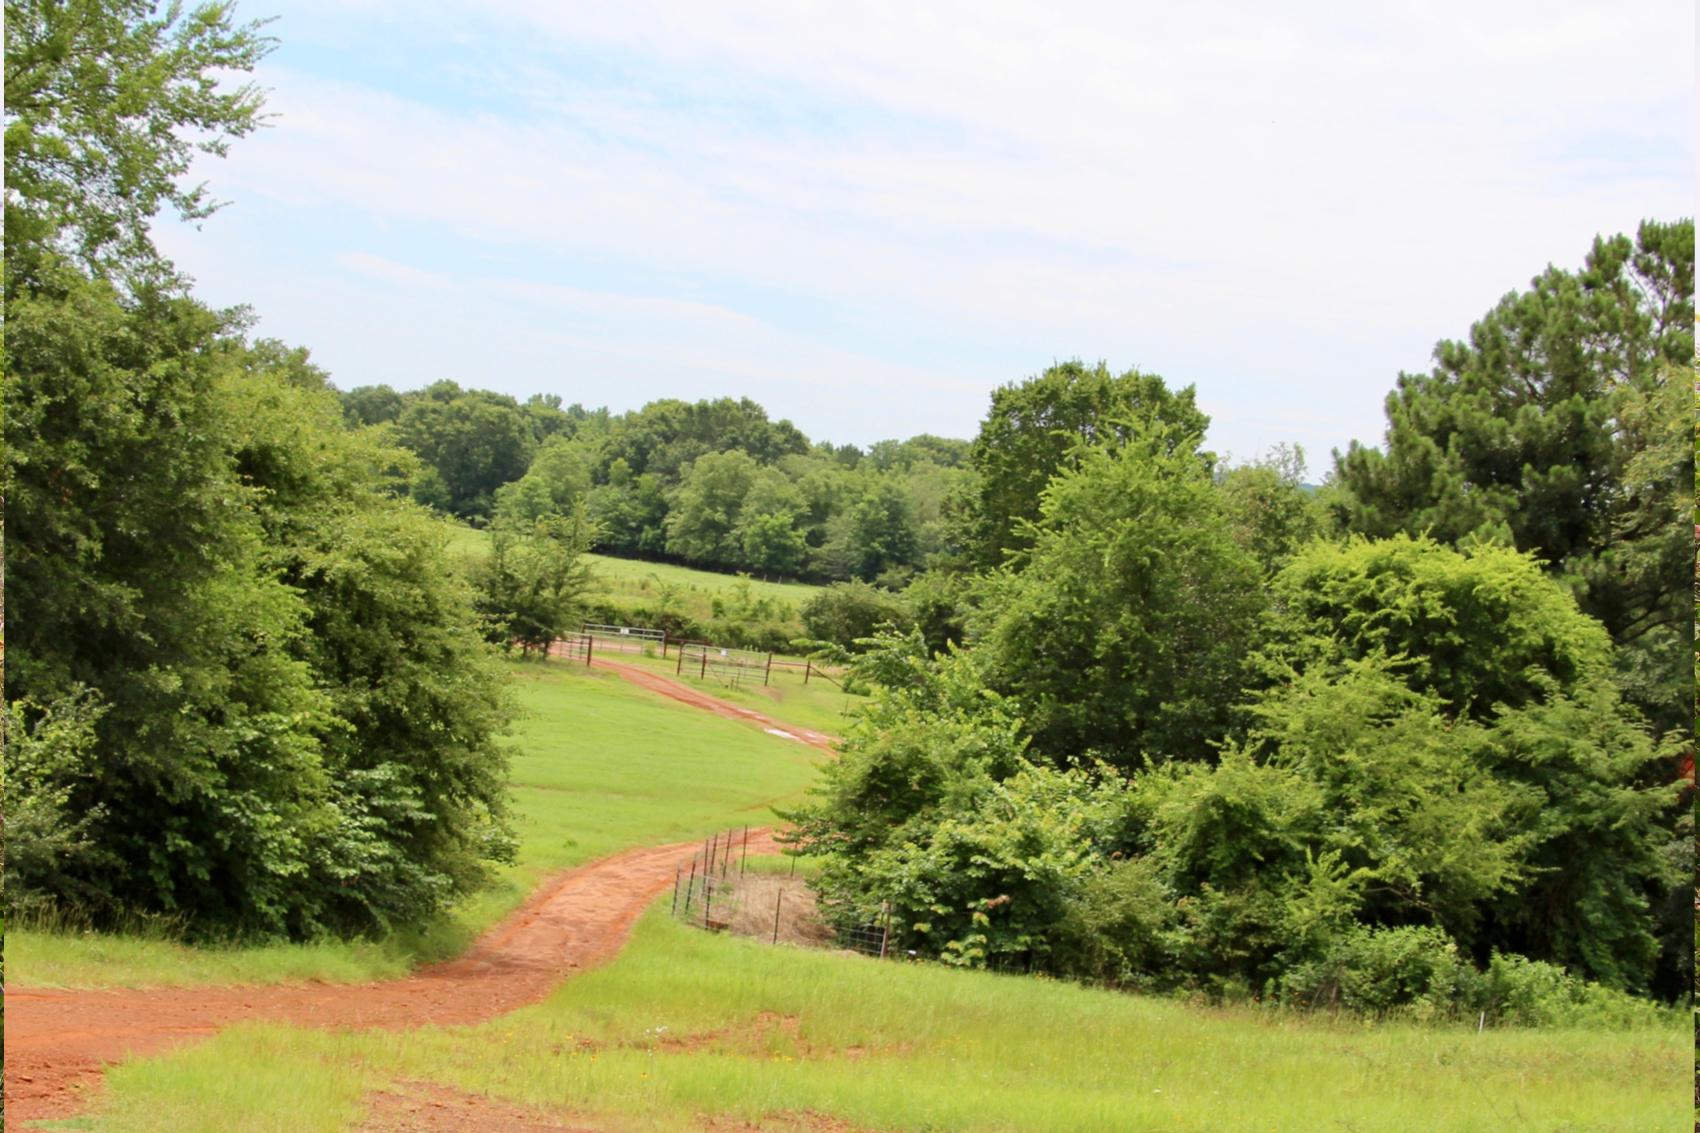 Winona Orchards